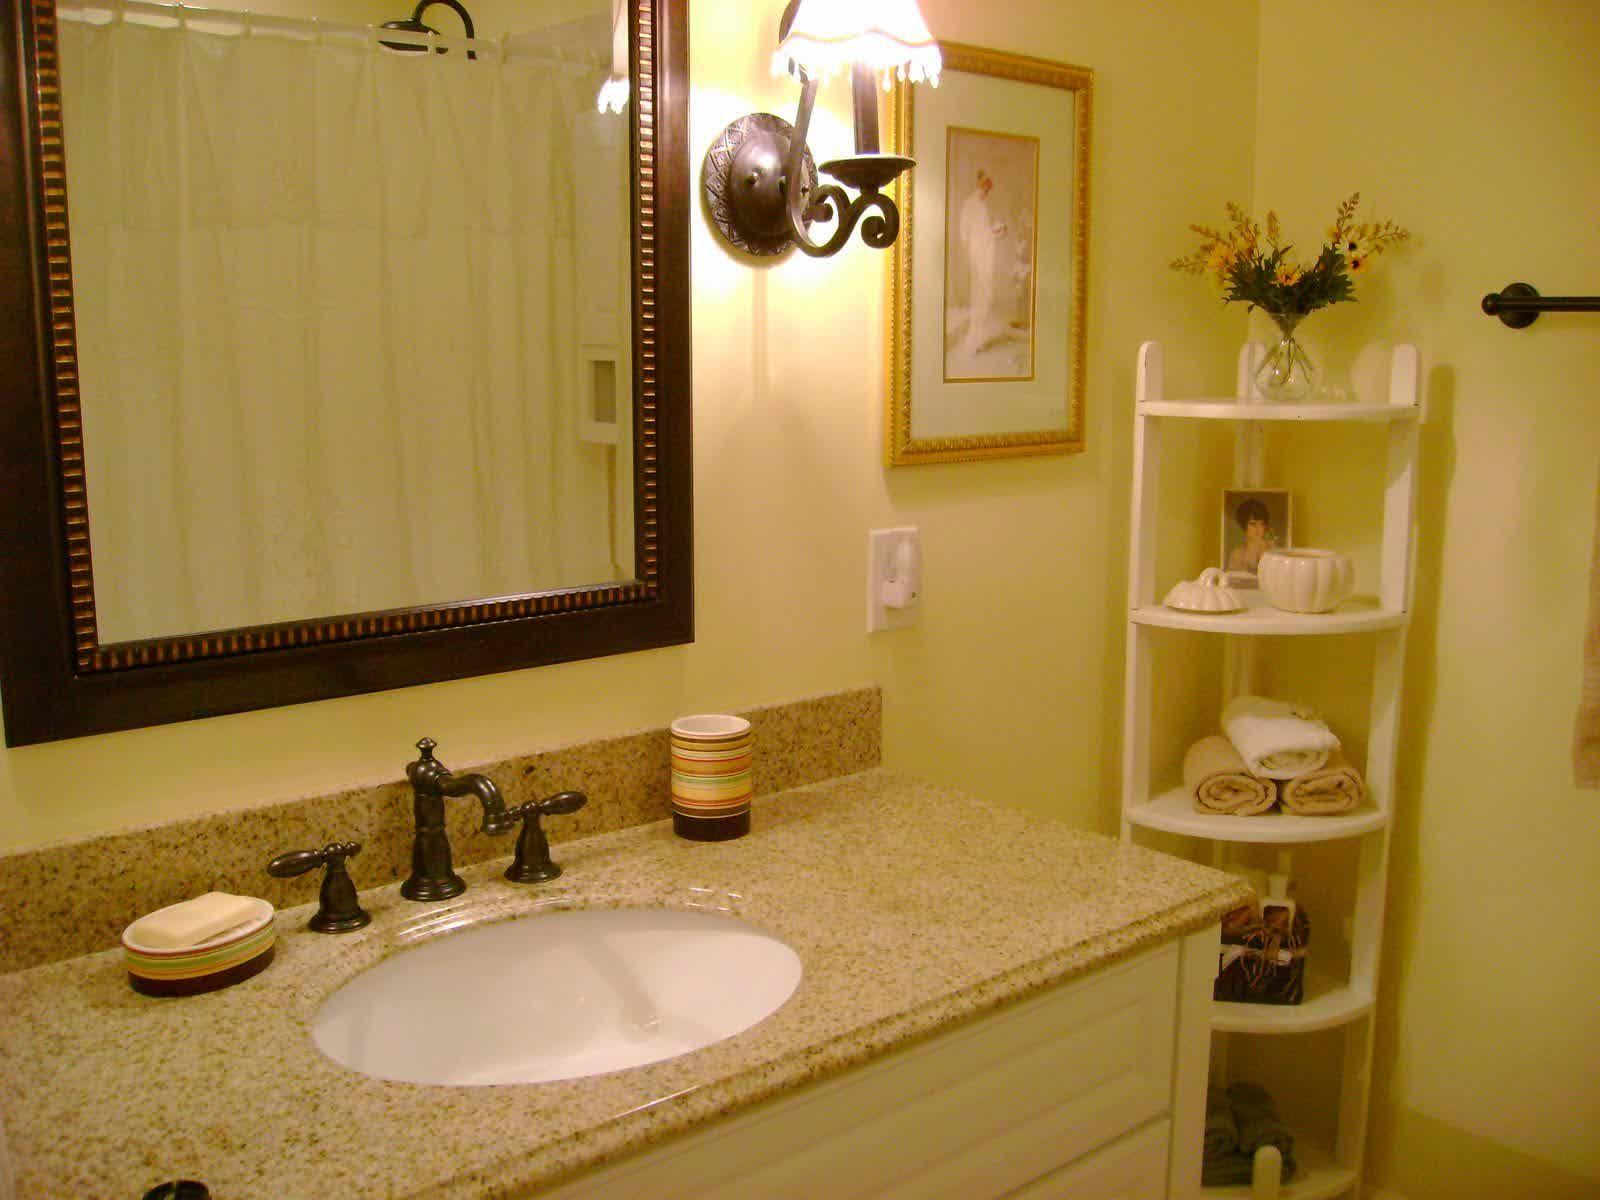 Bathroom Countertop Color Ideas Ideas Pinterest - Bathroom drawers on wheels for bathroom decor ideas